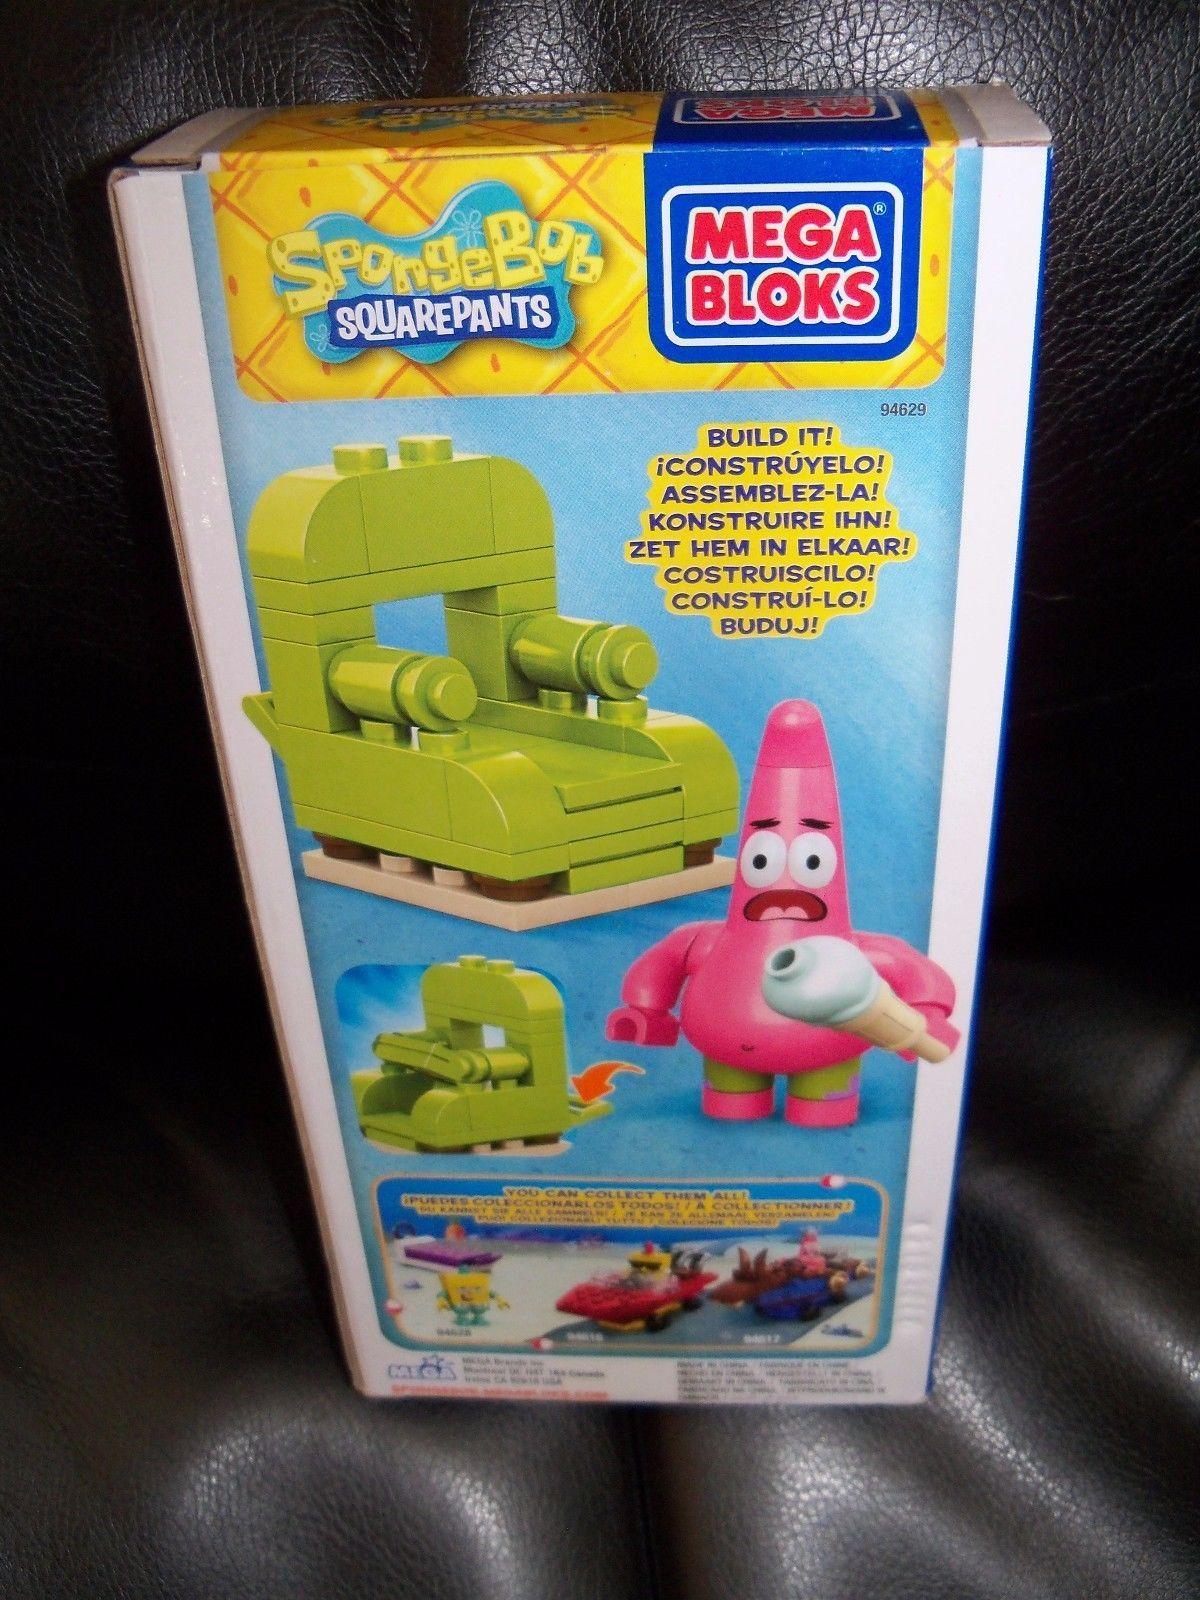 Mega Bloks Spongebob Wacky Packs - Patrick Model:18951241 NEW HTF